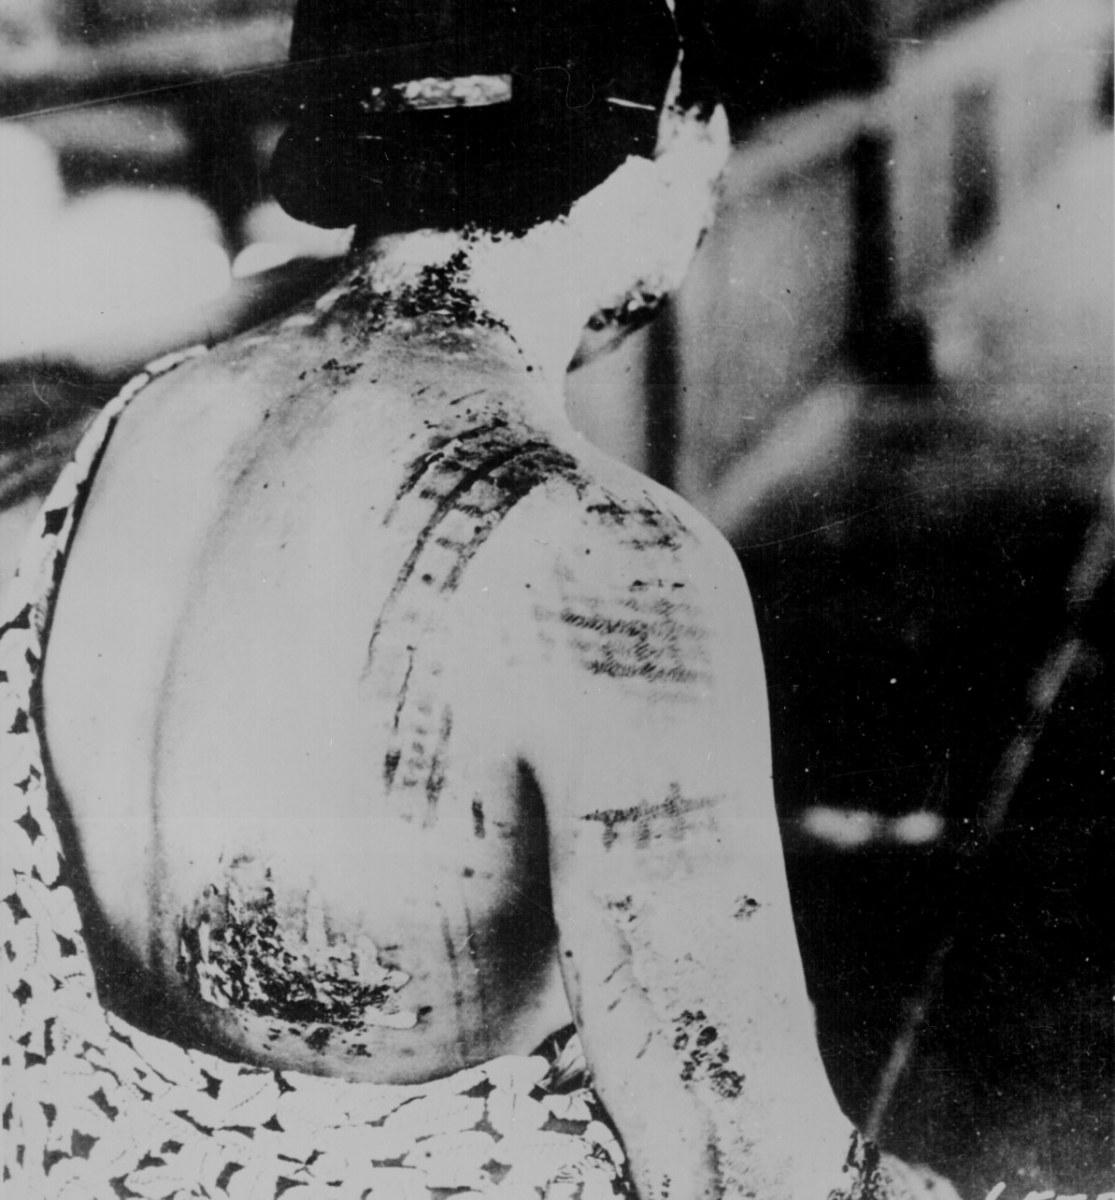 Kimono print's pattern blasted into the skin of a victim.